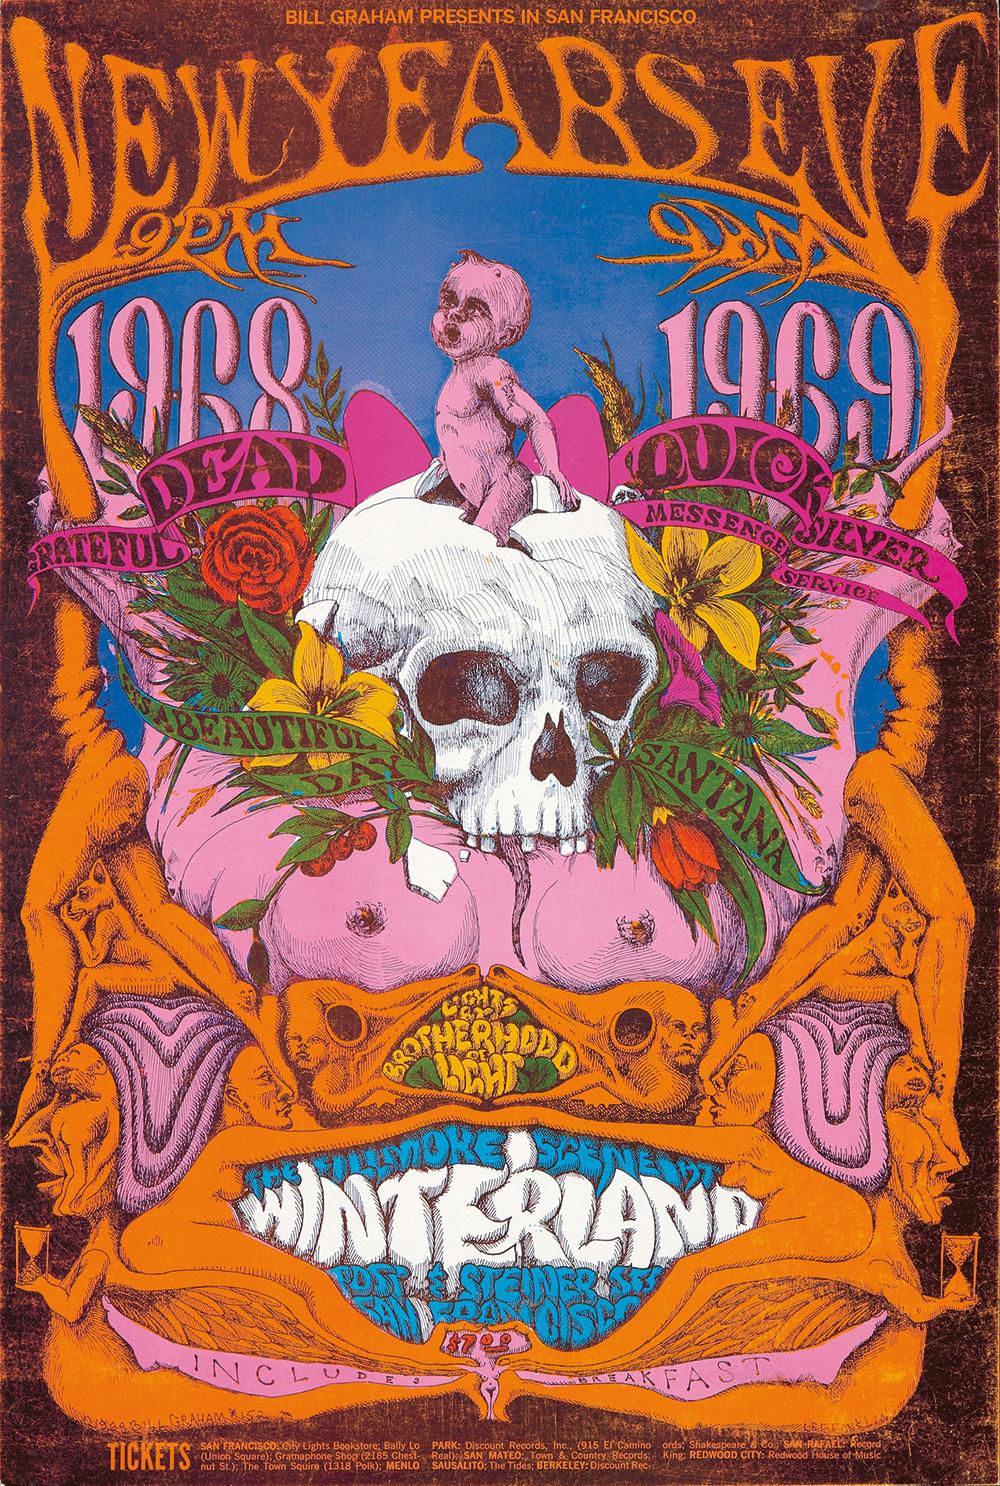 140. New Year's Eve / Grateful Dead / Quicksilver Messenger Service. 1968.